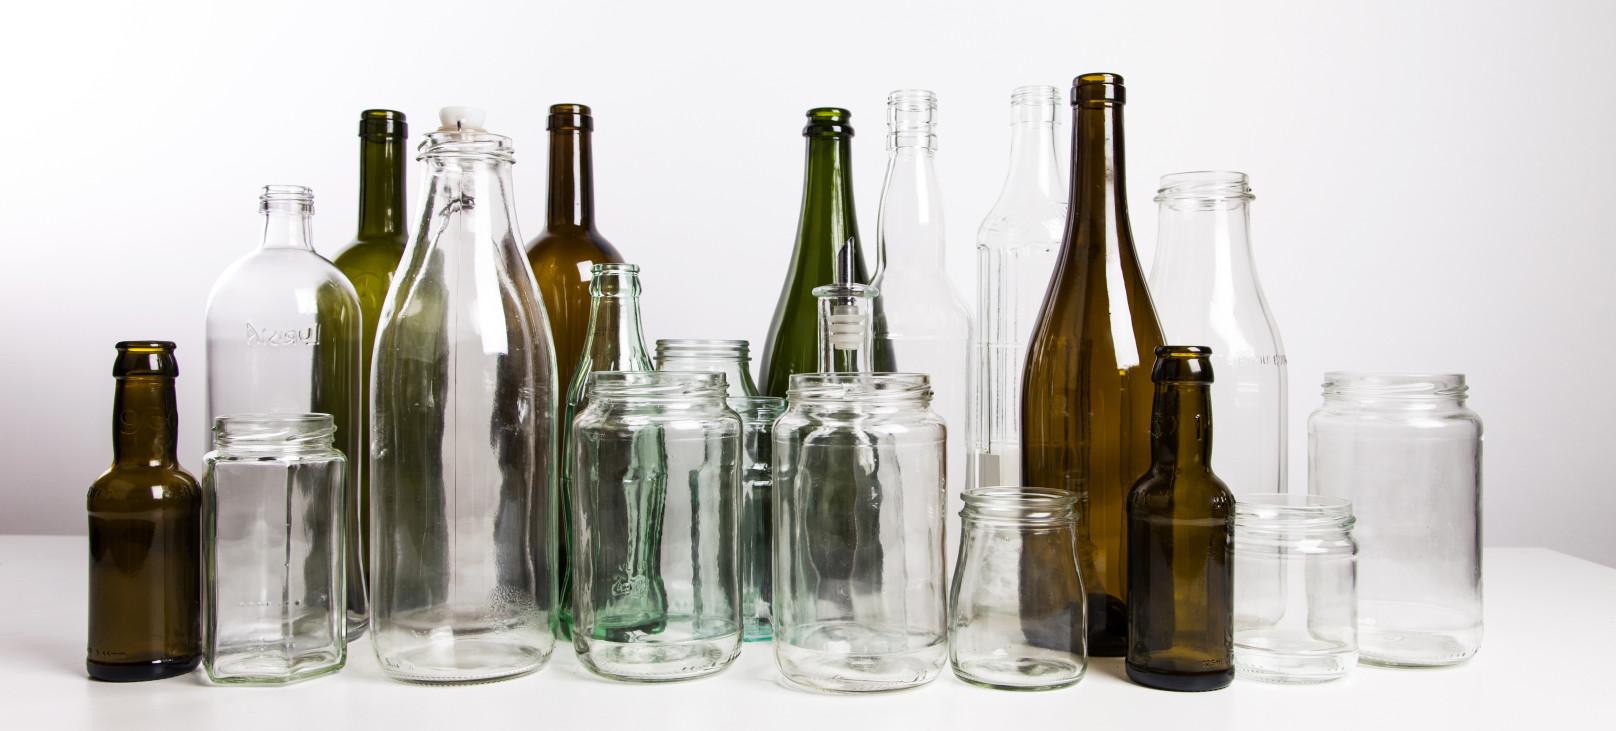 Cu l es la diferencia entre vidrio y cristal friends of glassfriends of glass - Fabrica de floreros de vidrio ...